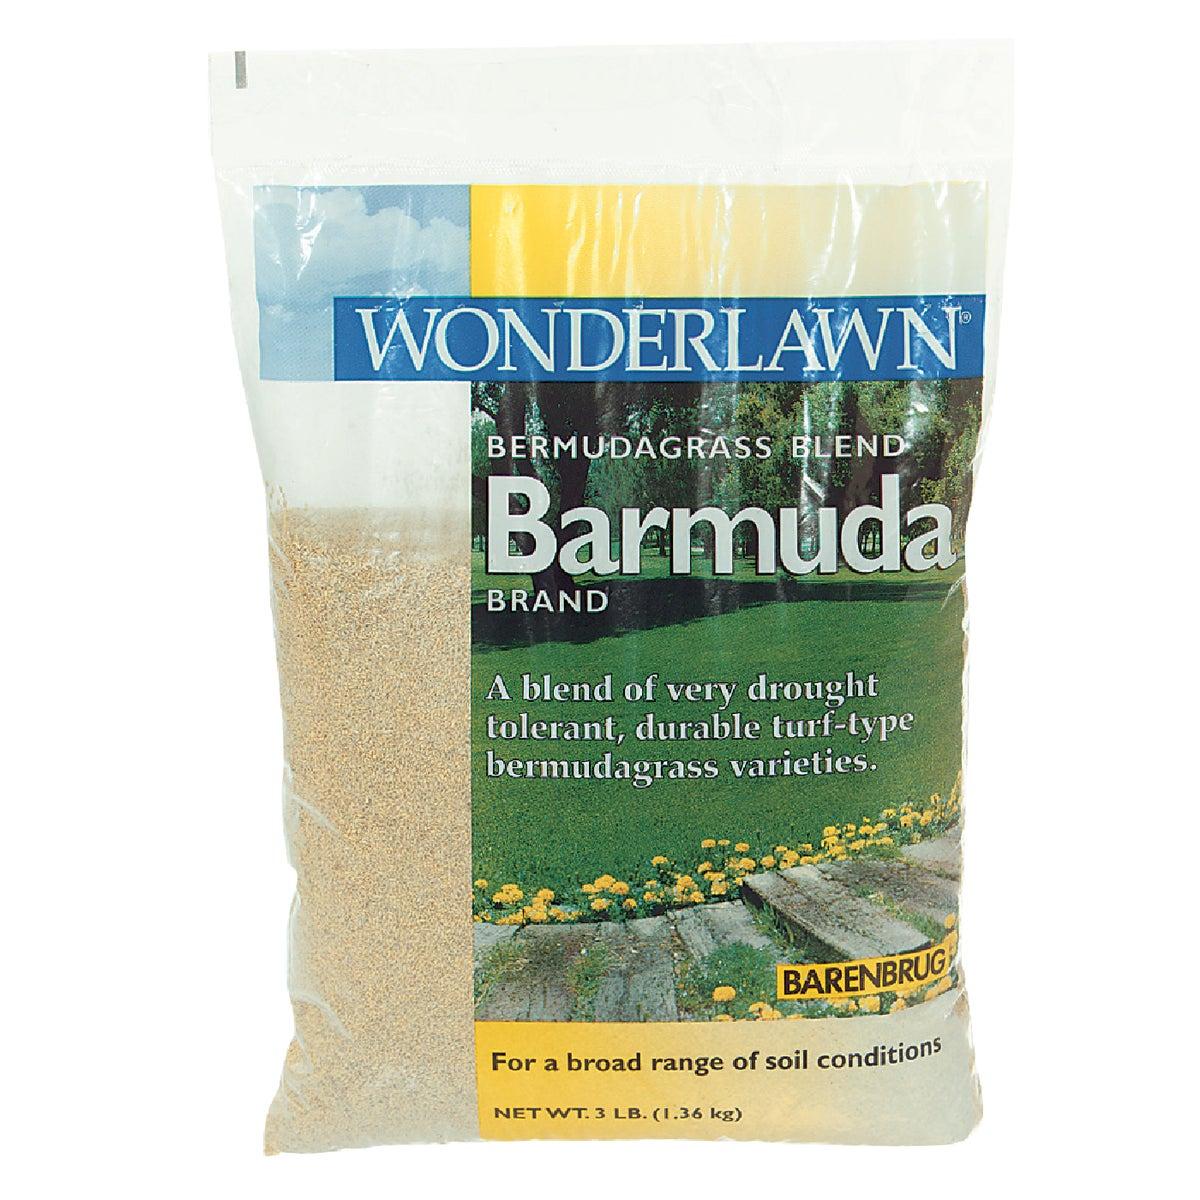 3LB BARMUDA GRASS SEED - 10058 by Barenbrug U S A